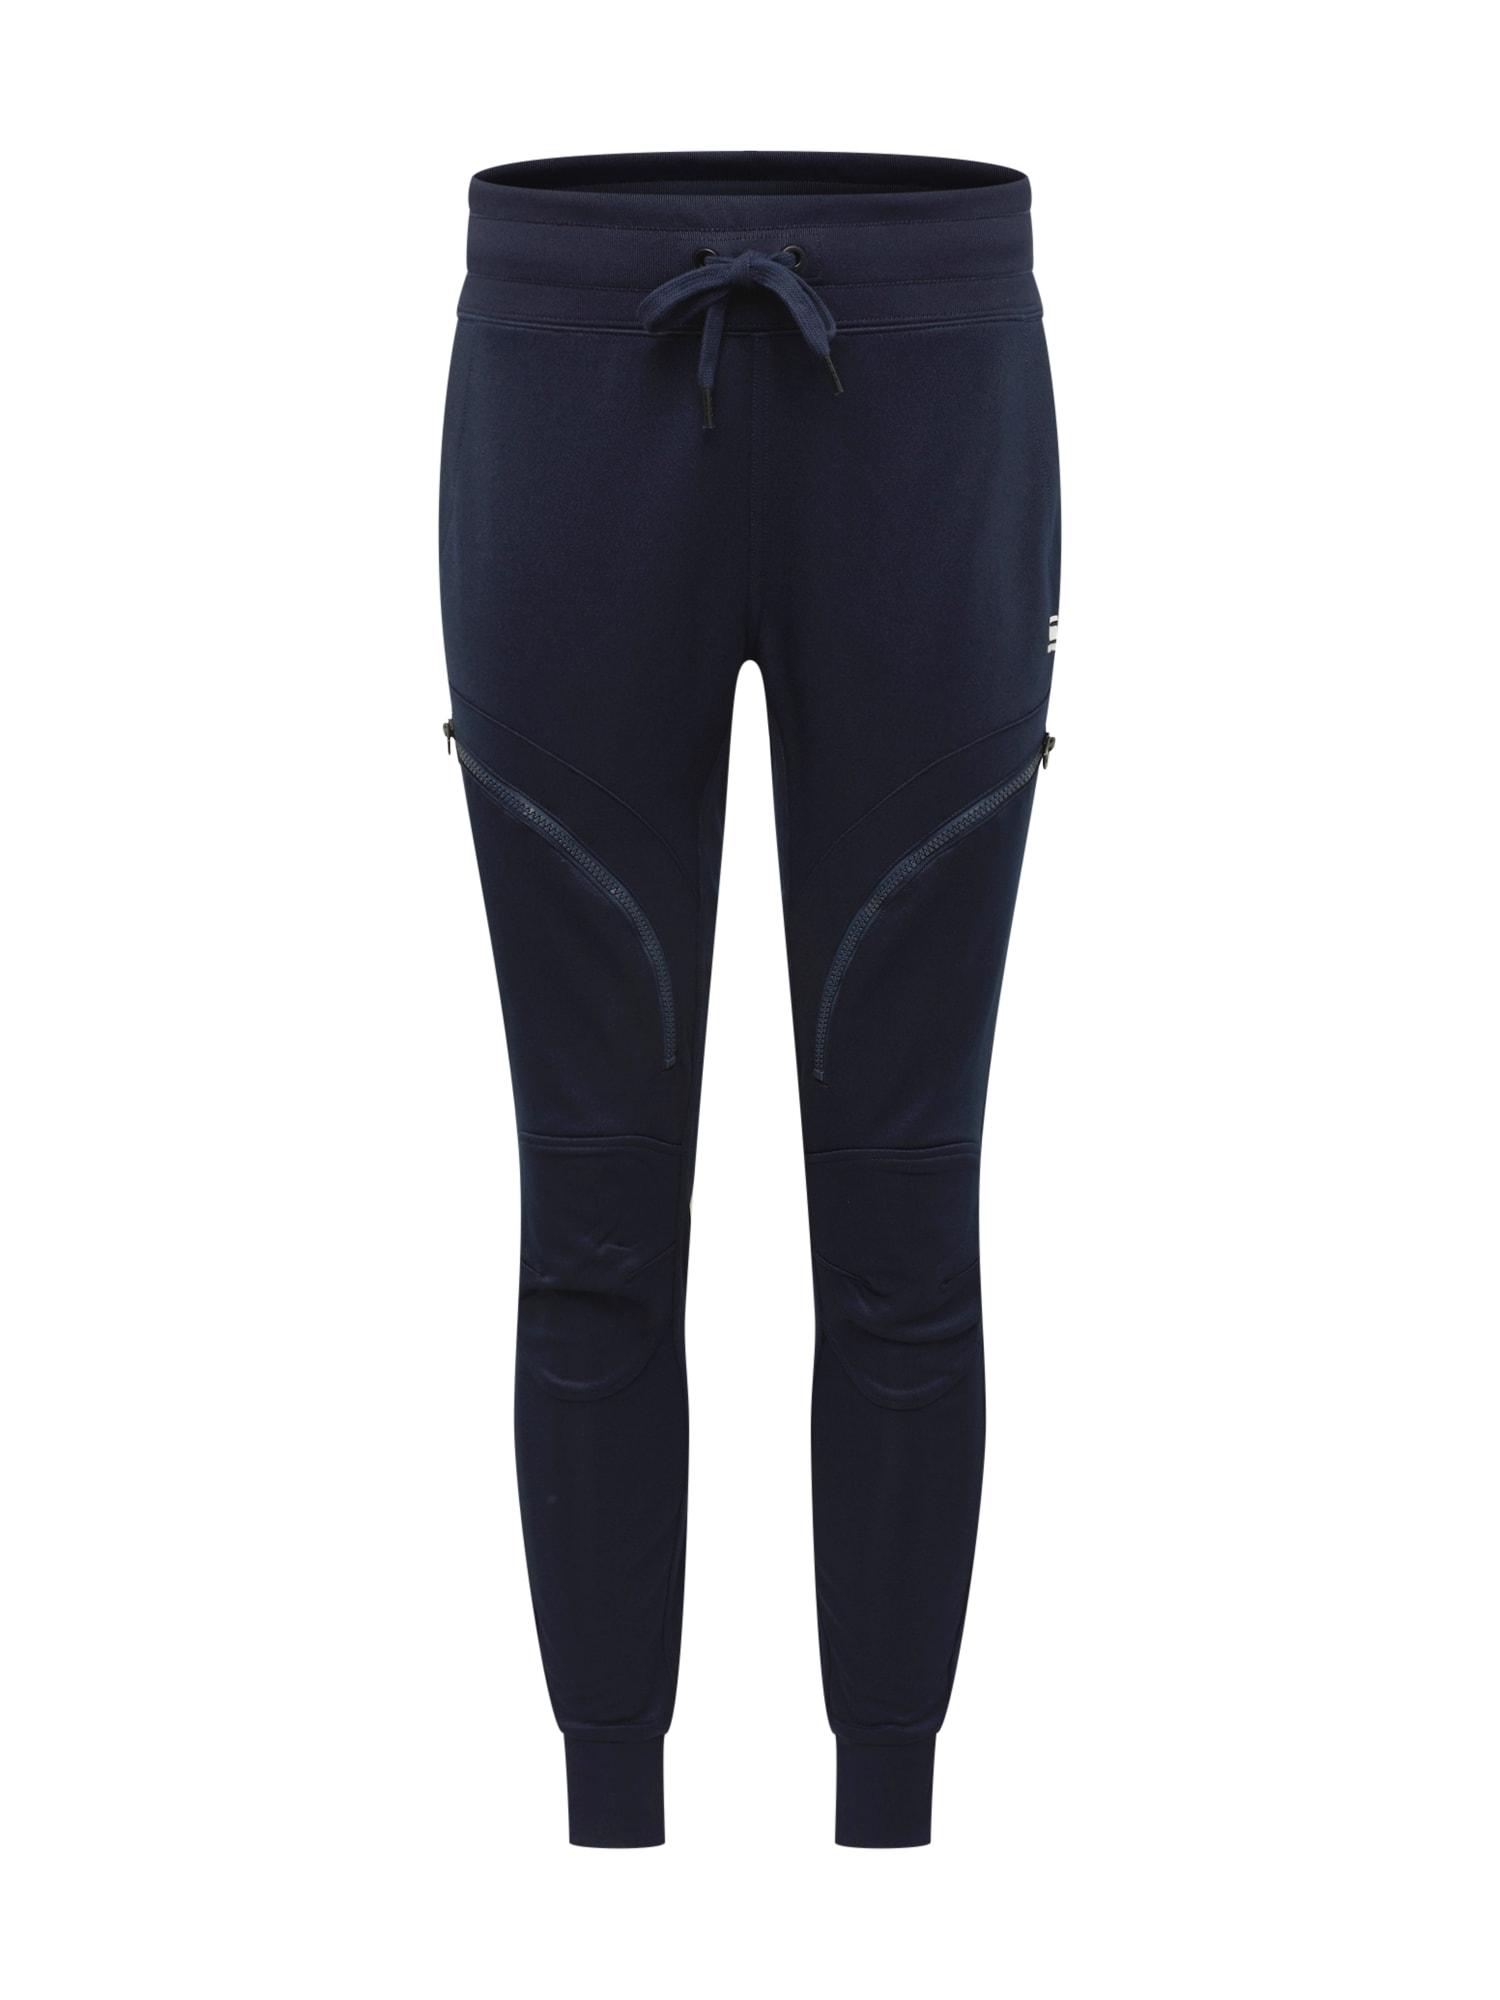 Kalhoty Air defence tmavě modrá G-STAR RAW